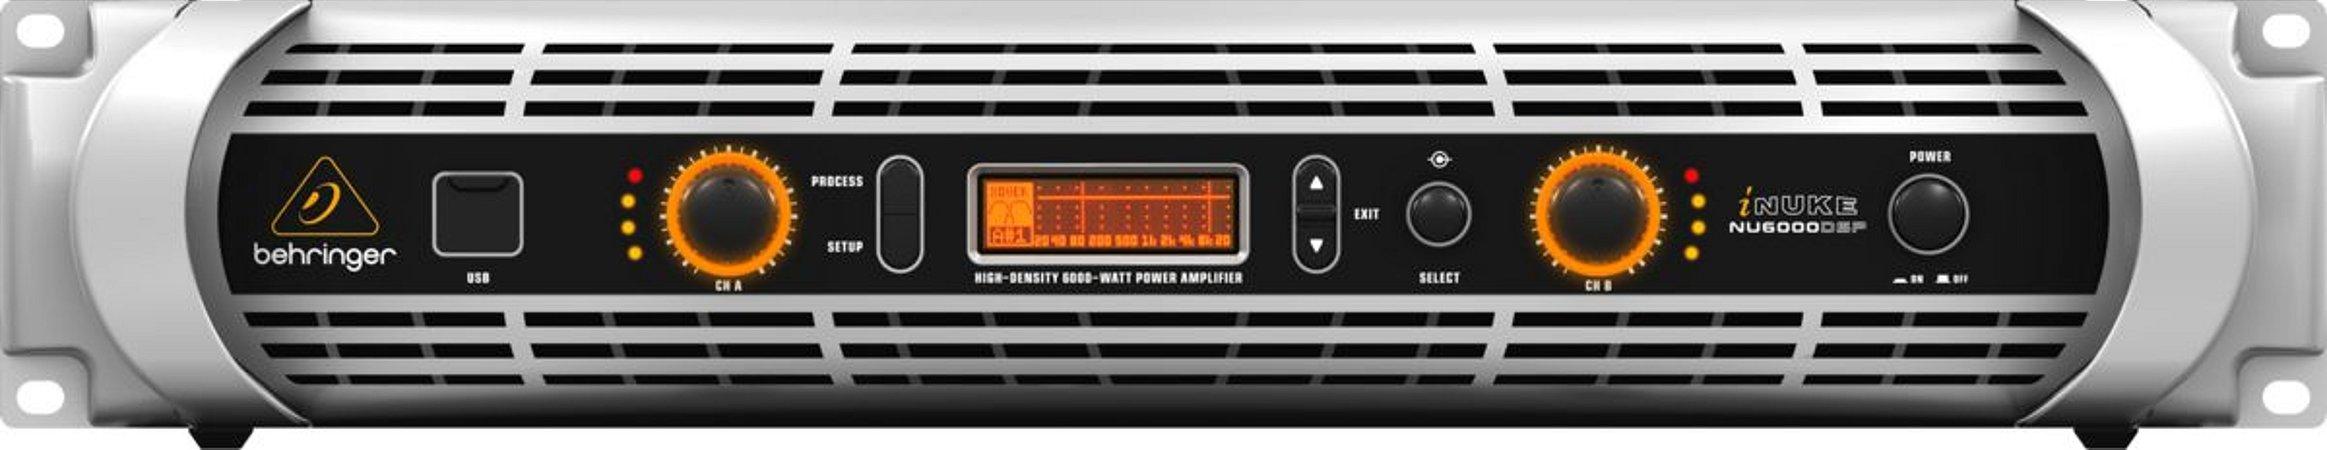 Amplificador de Potência Behringer Inuke DSP NU6000 6000W  DSP 220V